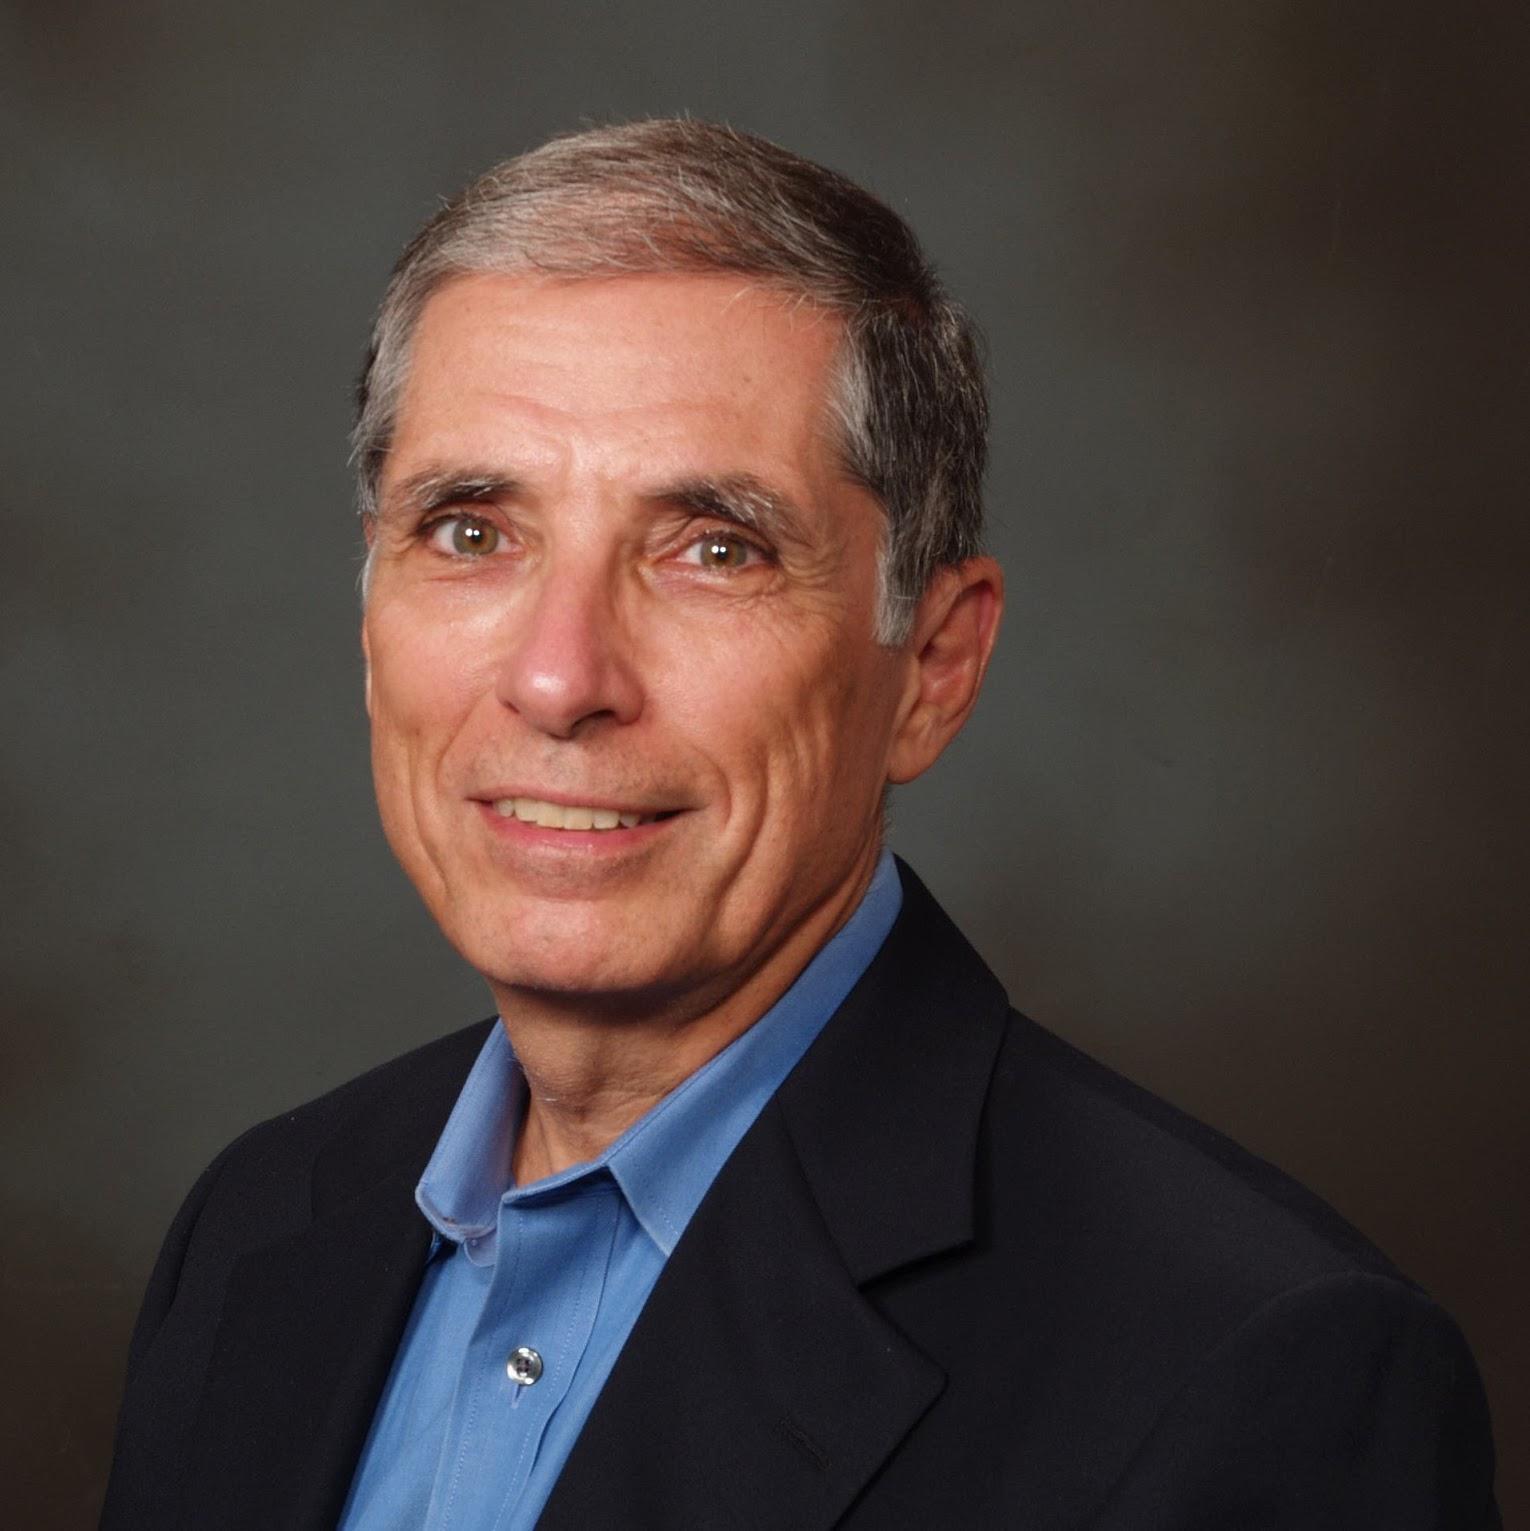 David Carbonell, Ph.D.